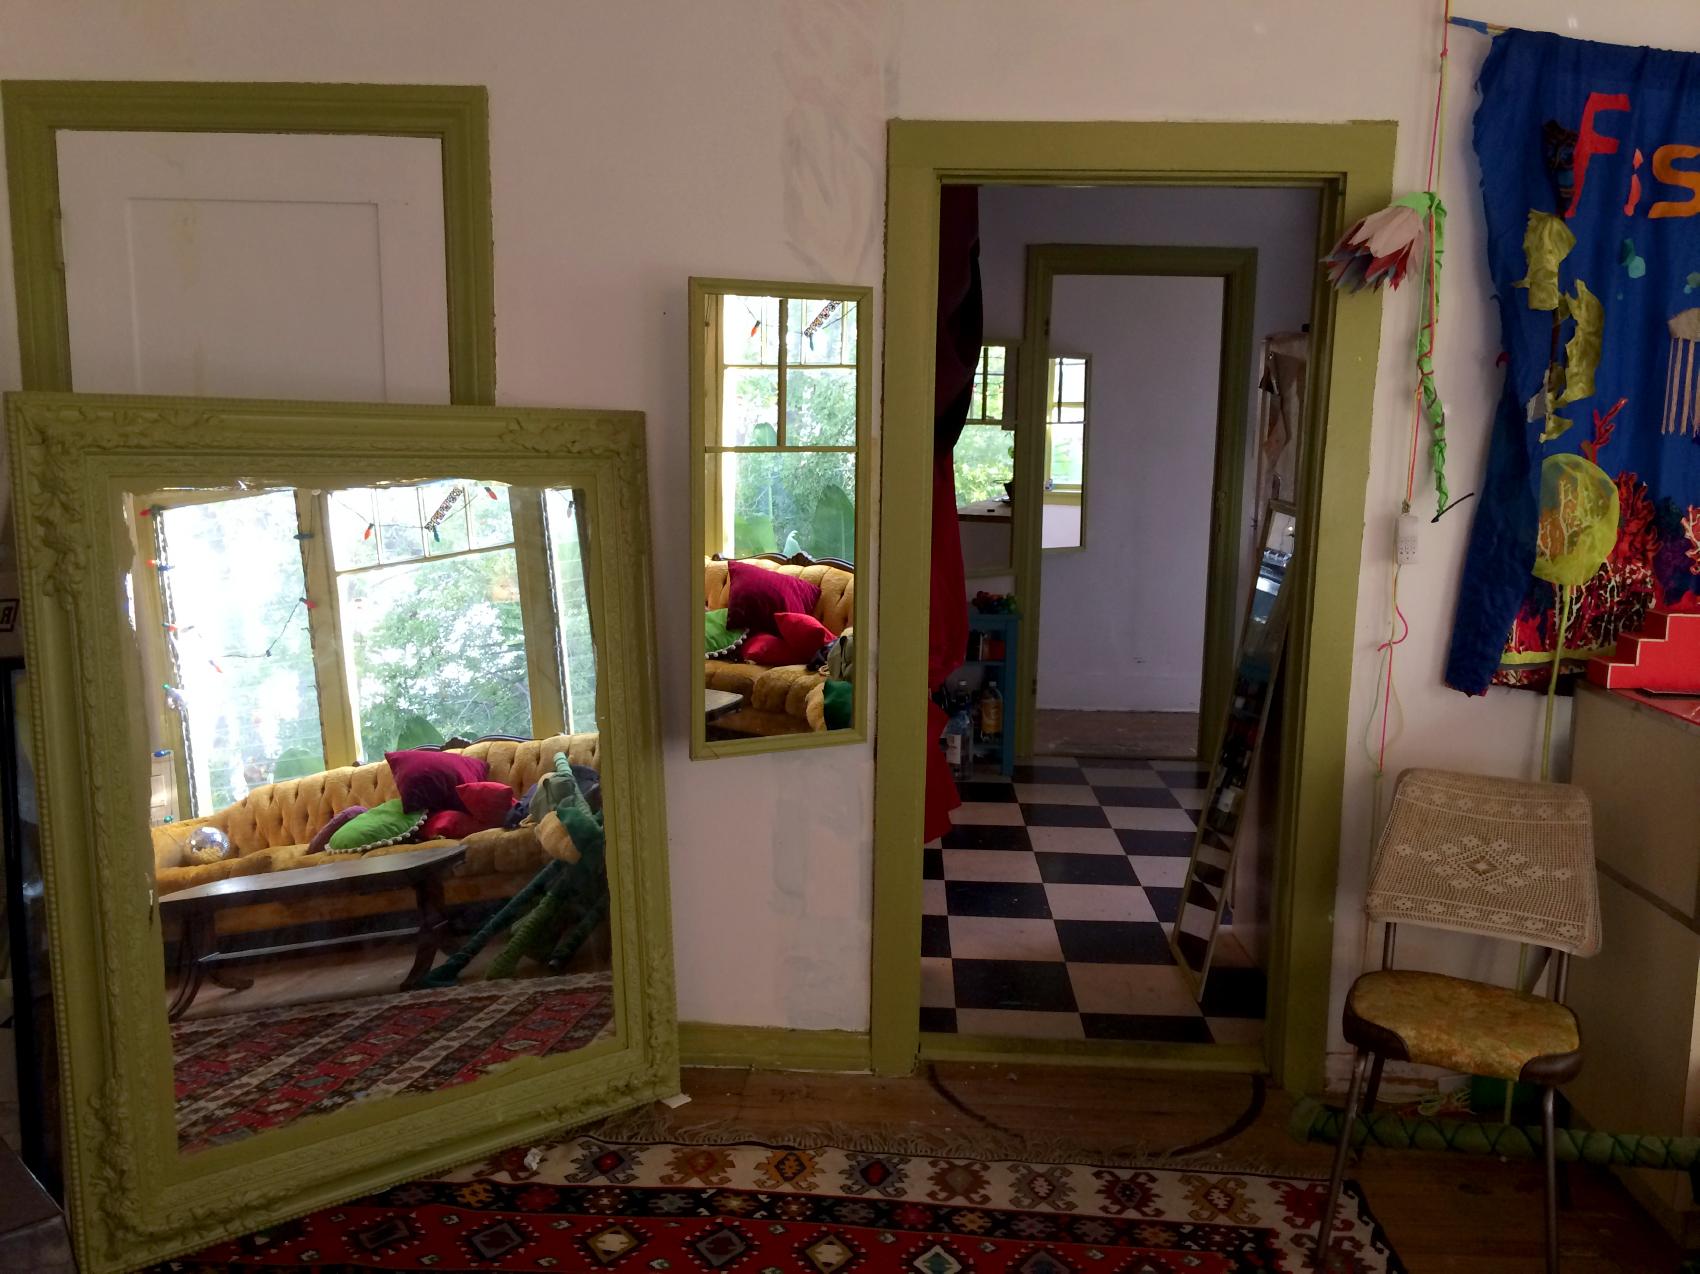 mirrors house.jpg